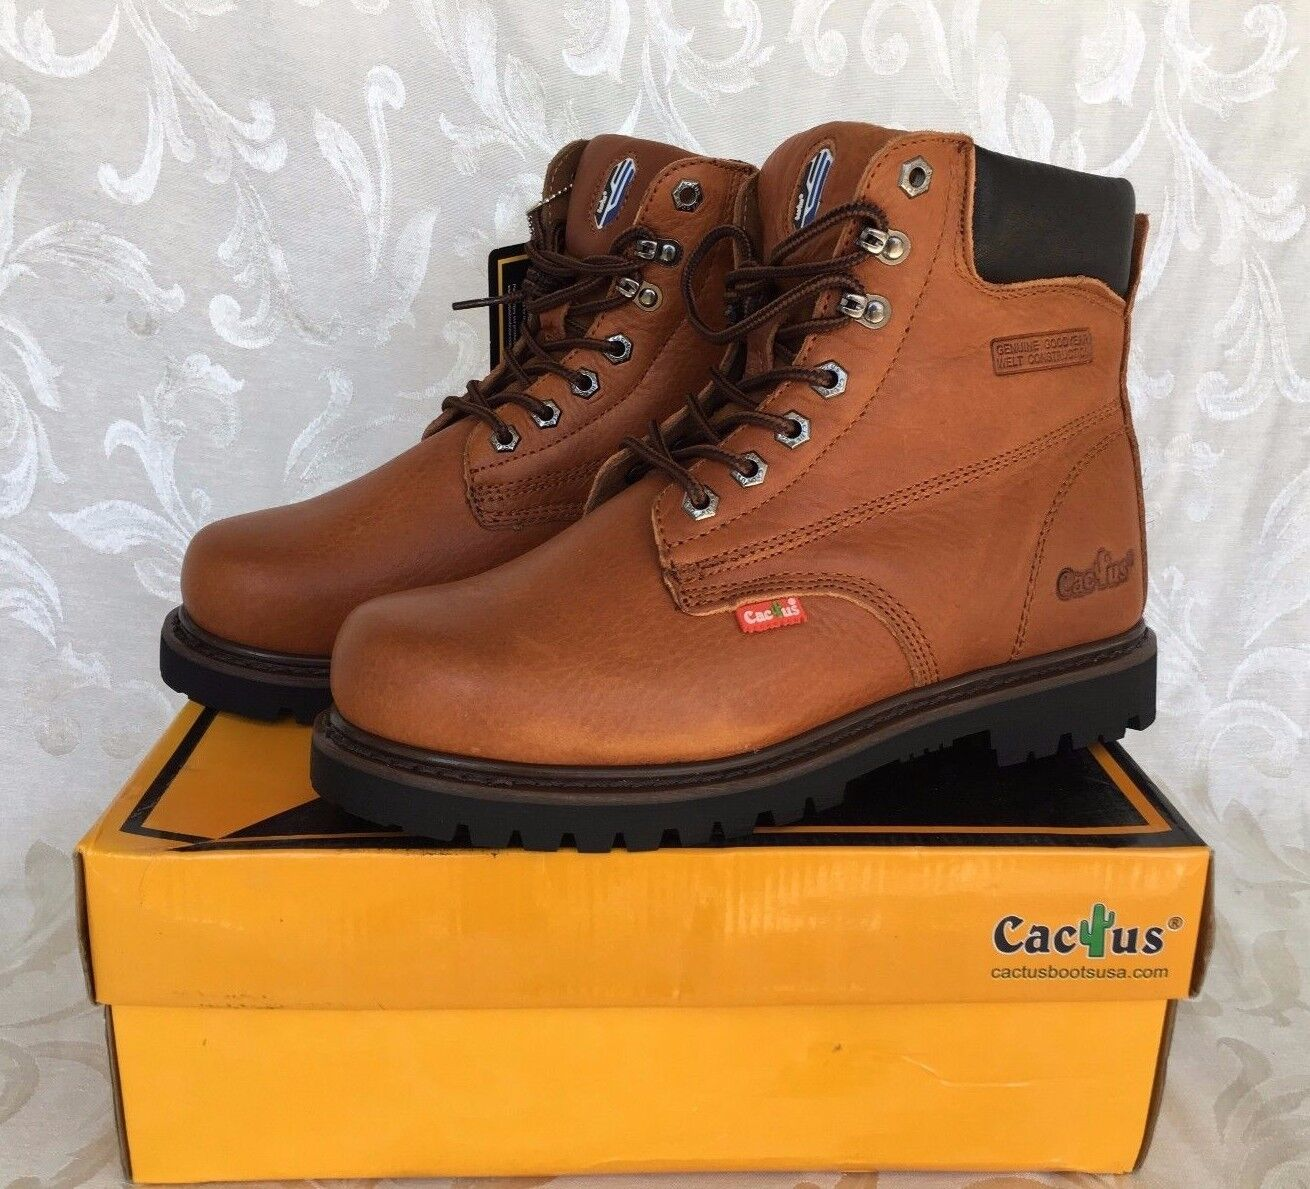 Cactus Men Men Men Light braun 6  Leather Work Stiefel Oil Resistant 627 Größes Comfort Fit 7fd472